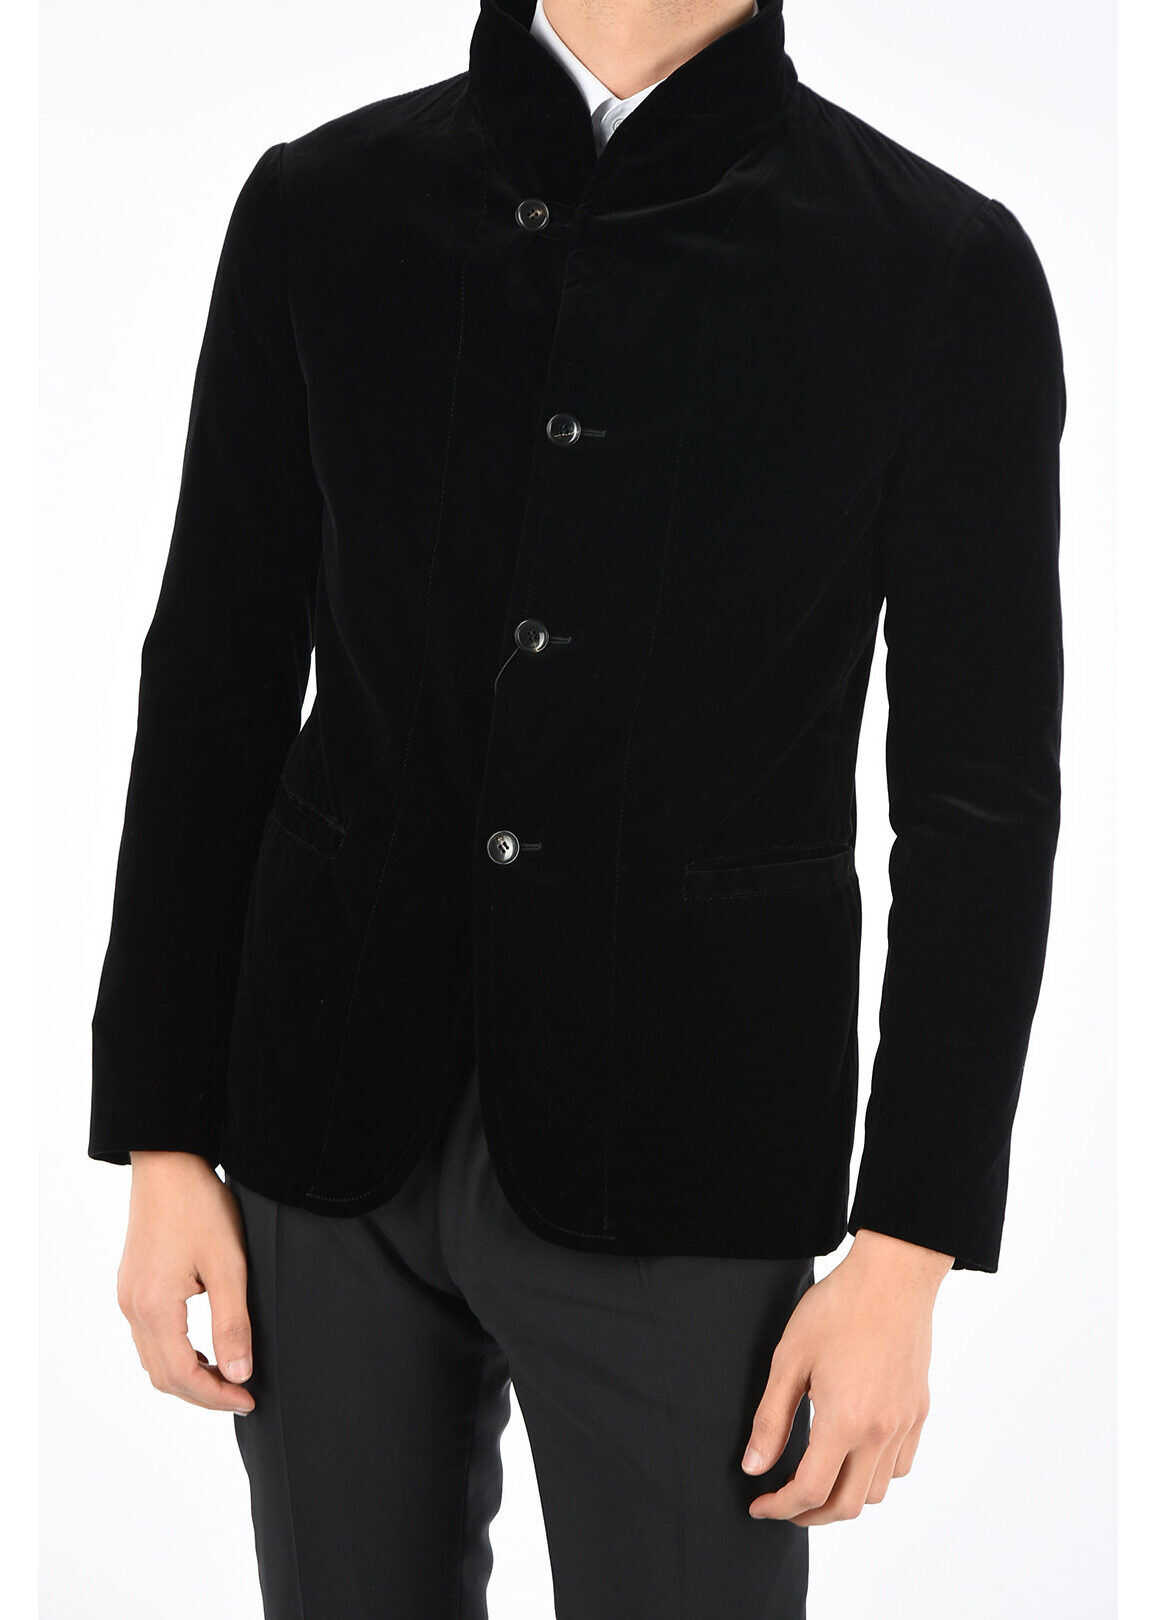 Armani COLLEZIONI velvet blazer BLACK imagine